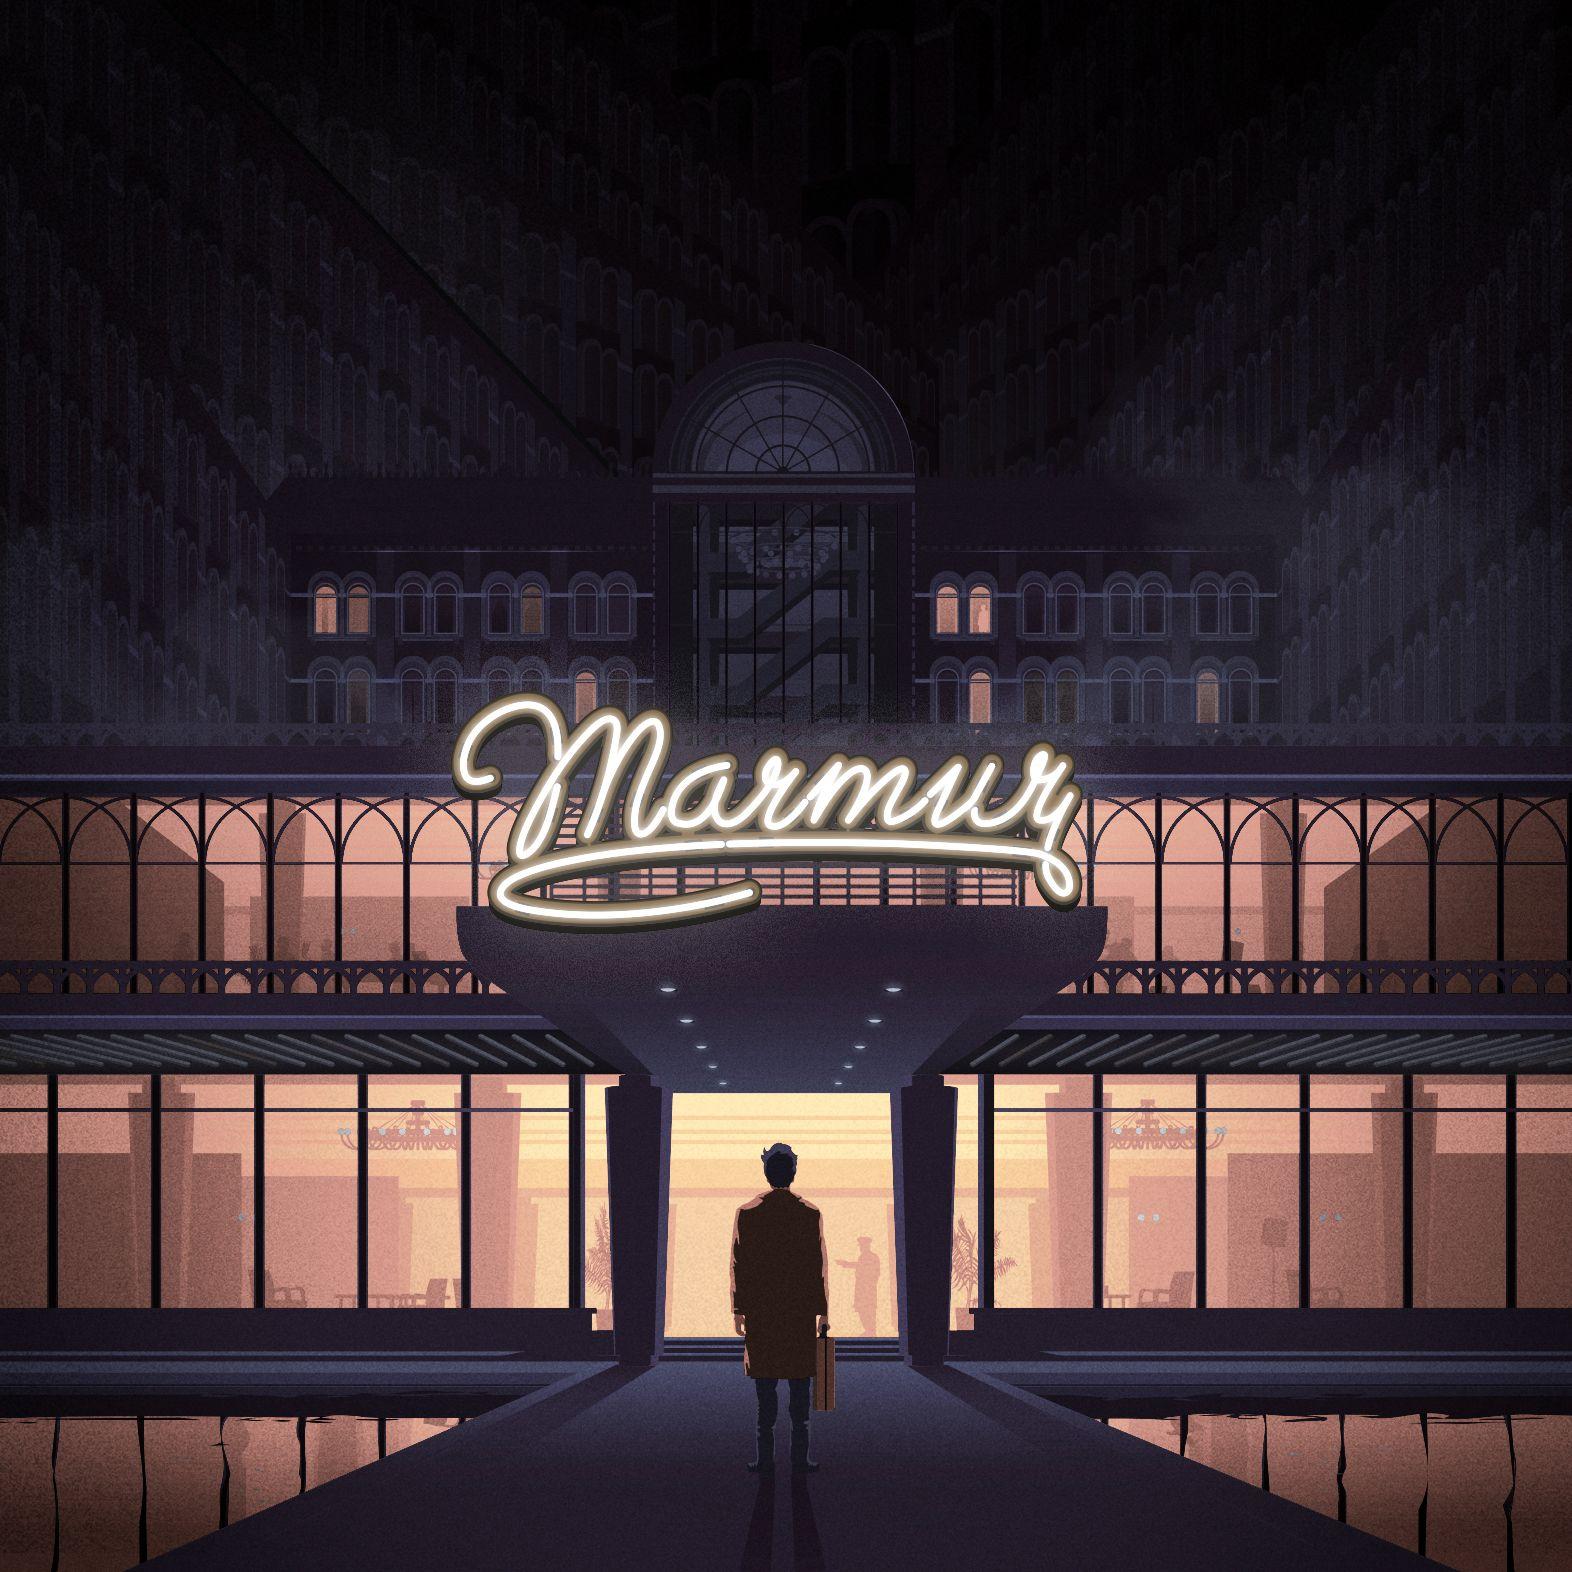 Taco Hemingway - Marmur album cover